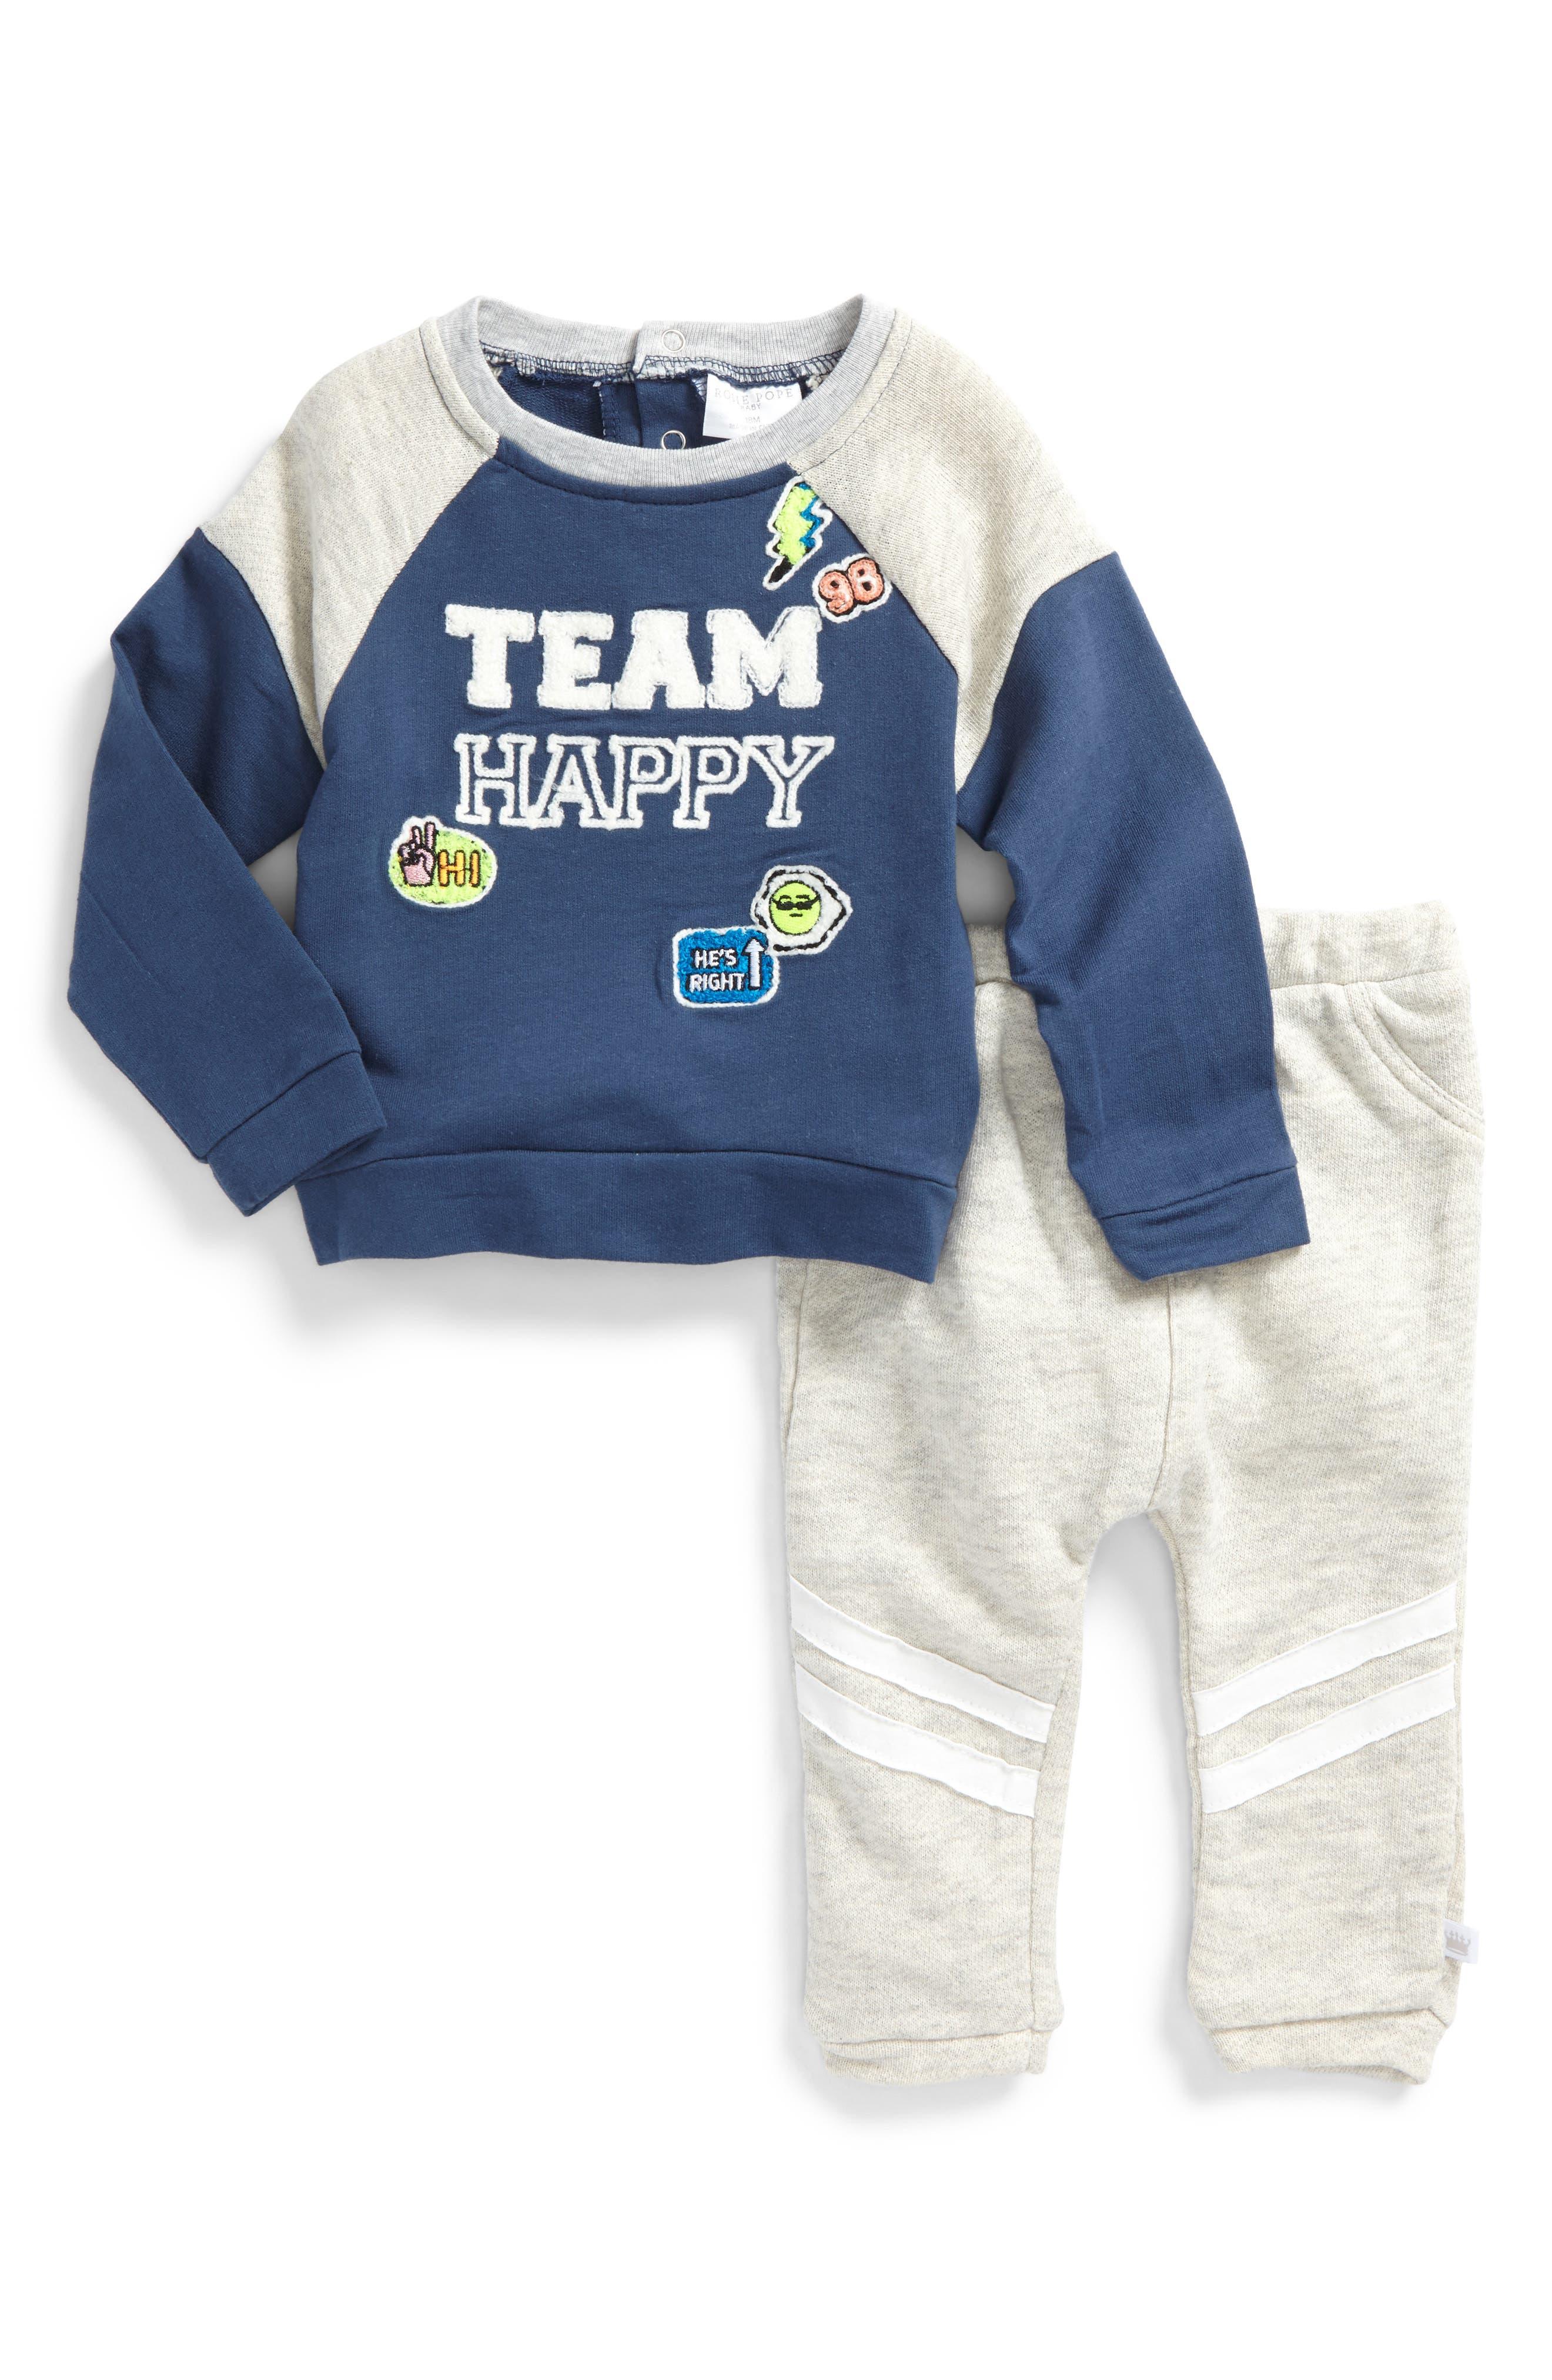 Main Image - Rosie Pope Team Happy Sweatshirt & Sweatpants Set (Baby Boys)